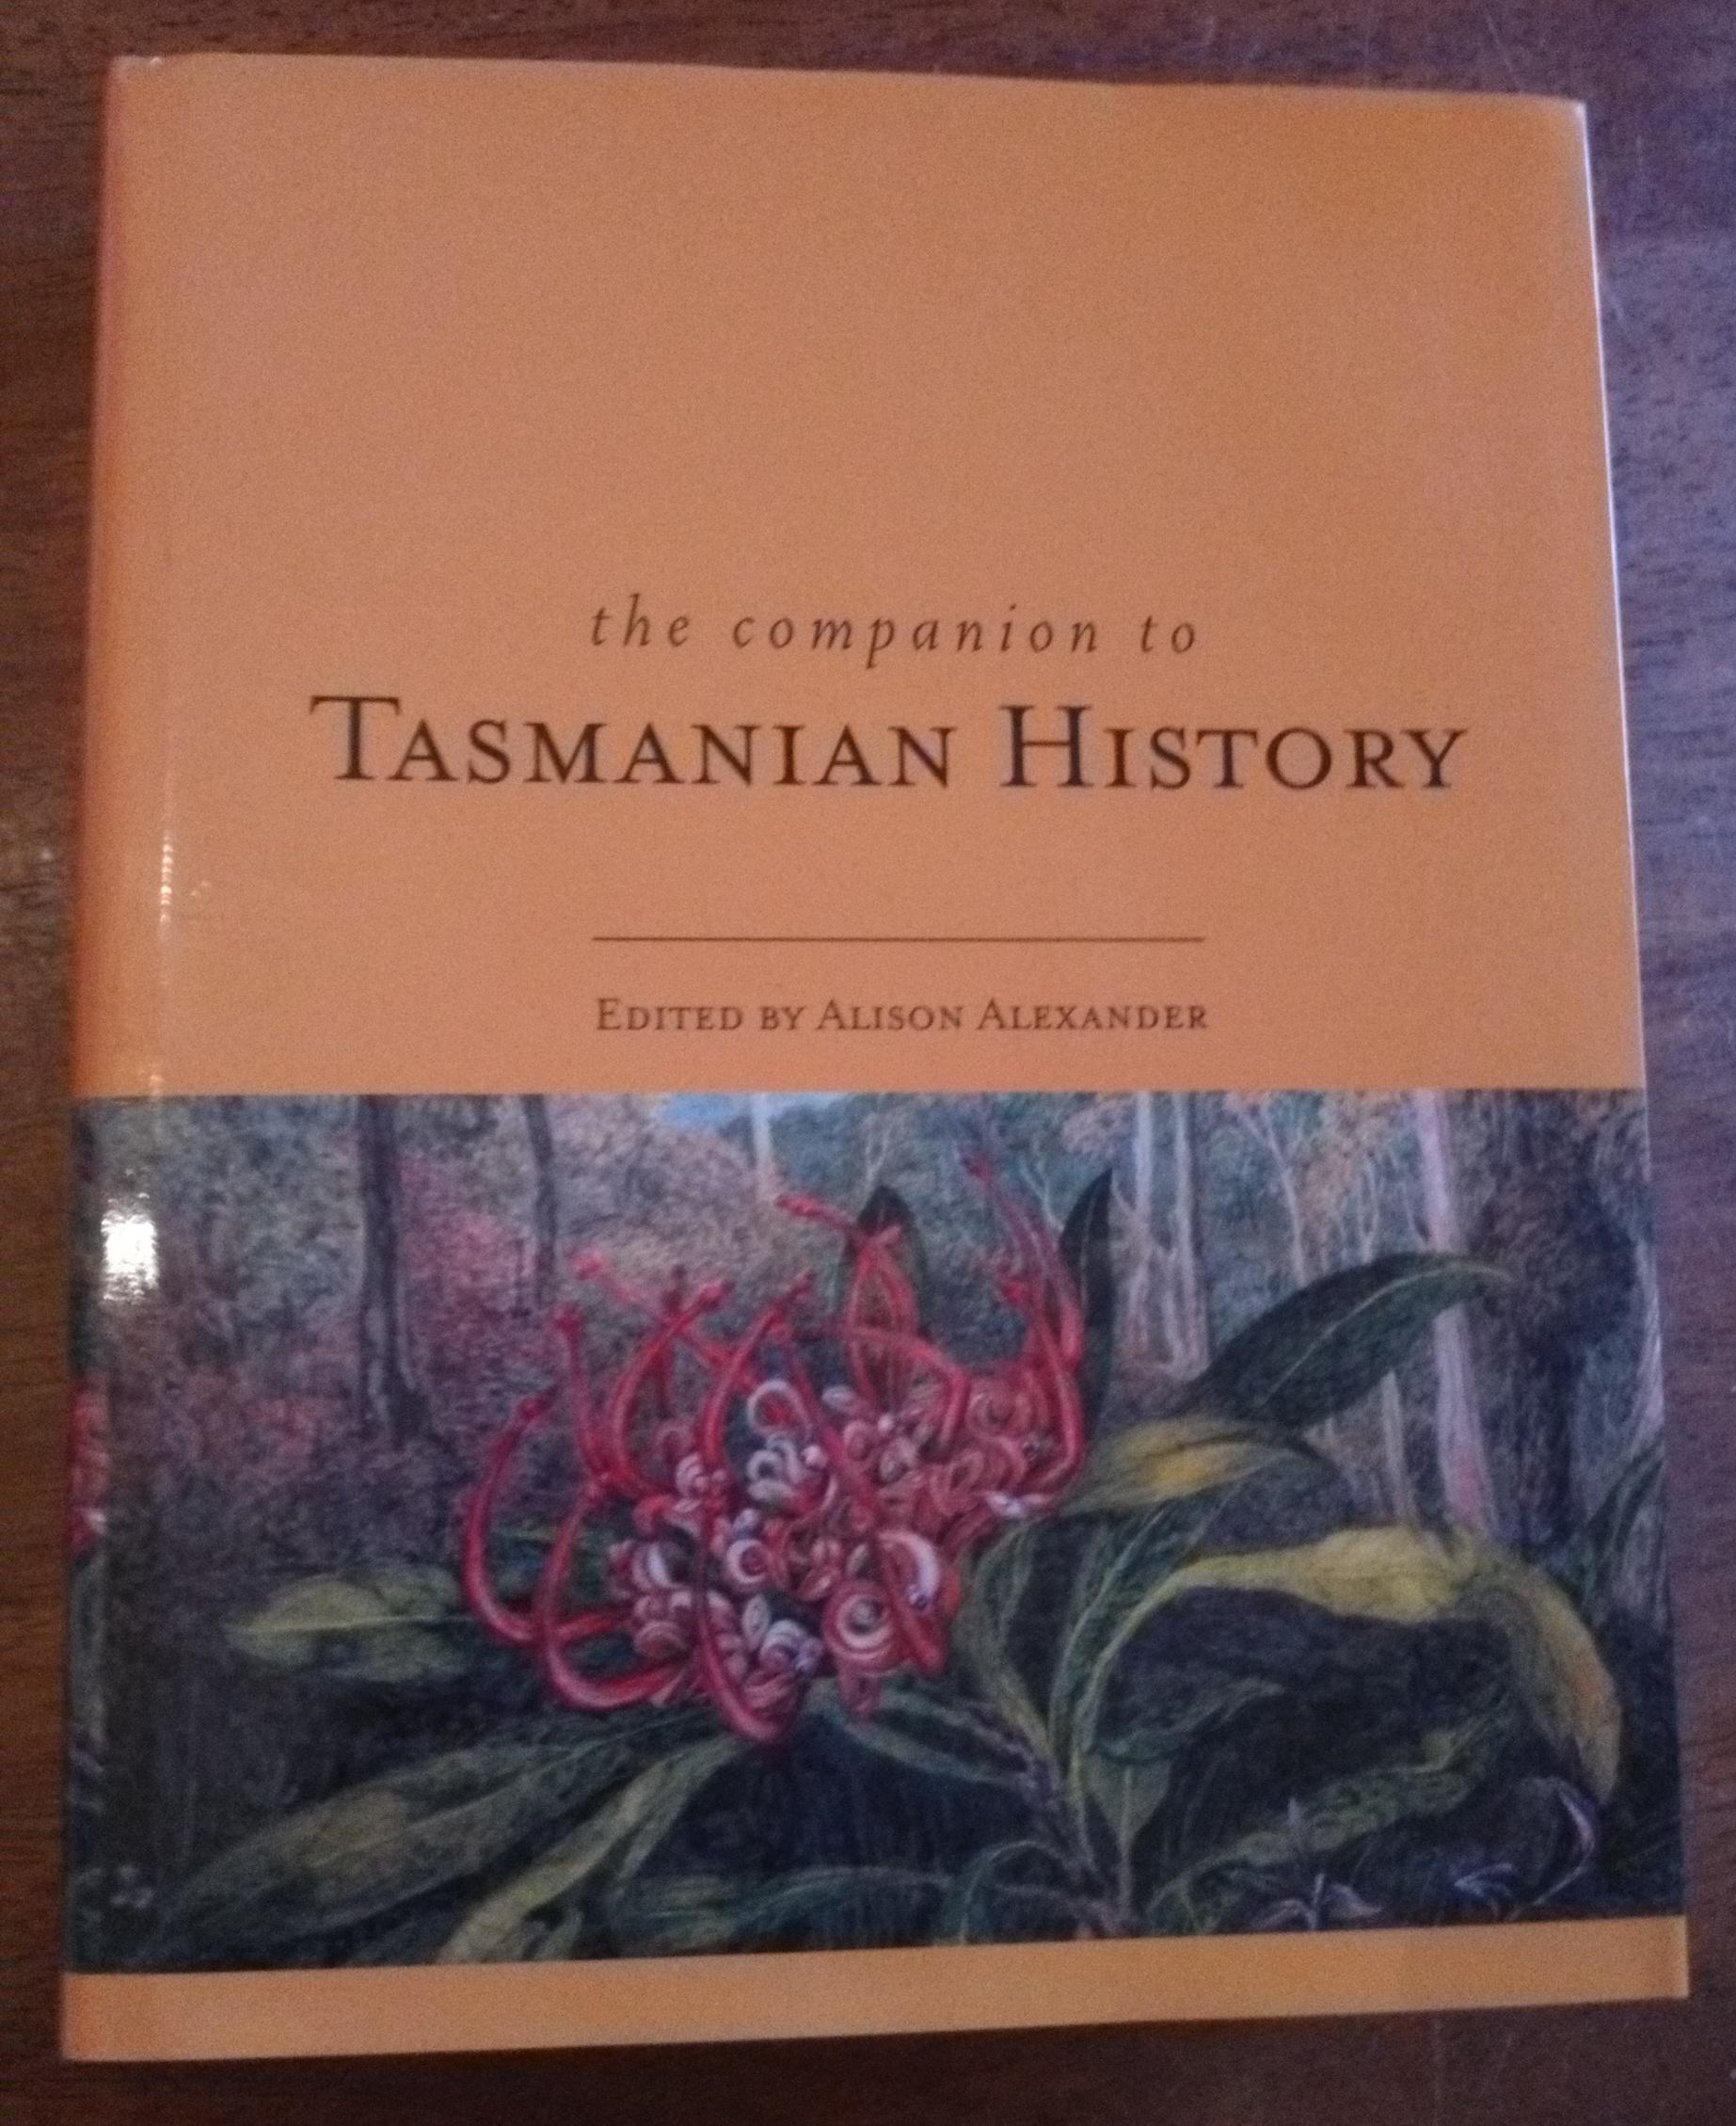 The Companion to Tasmanian History